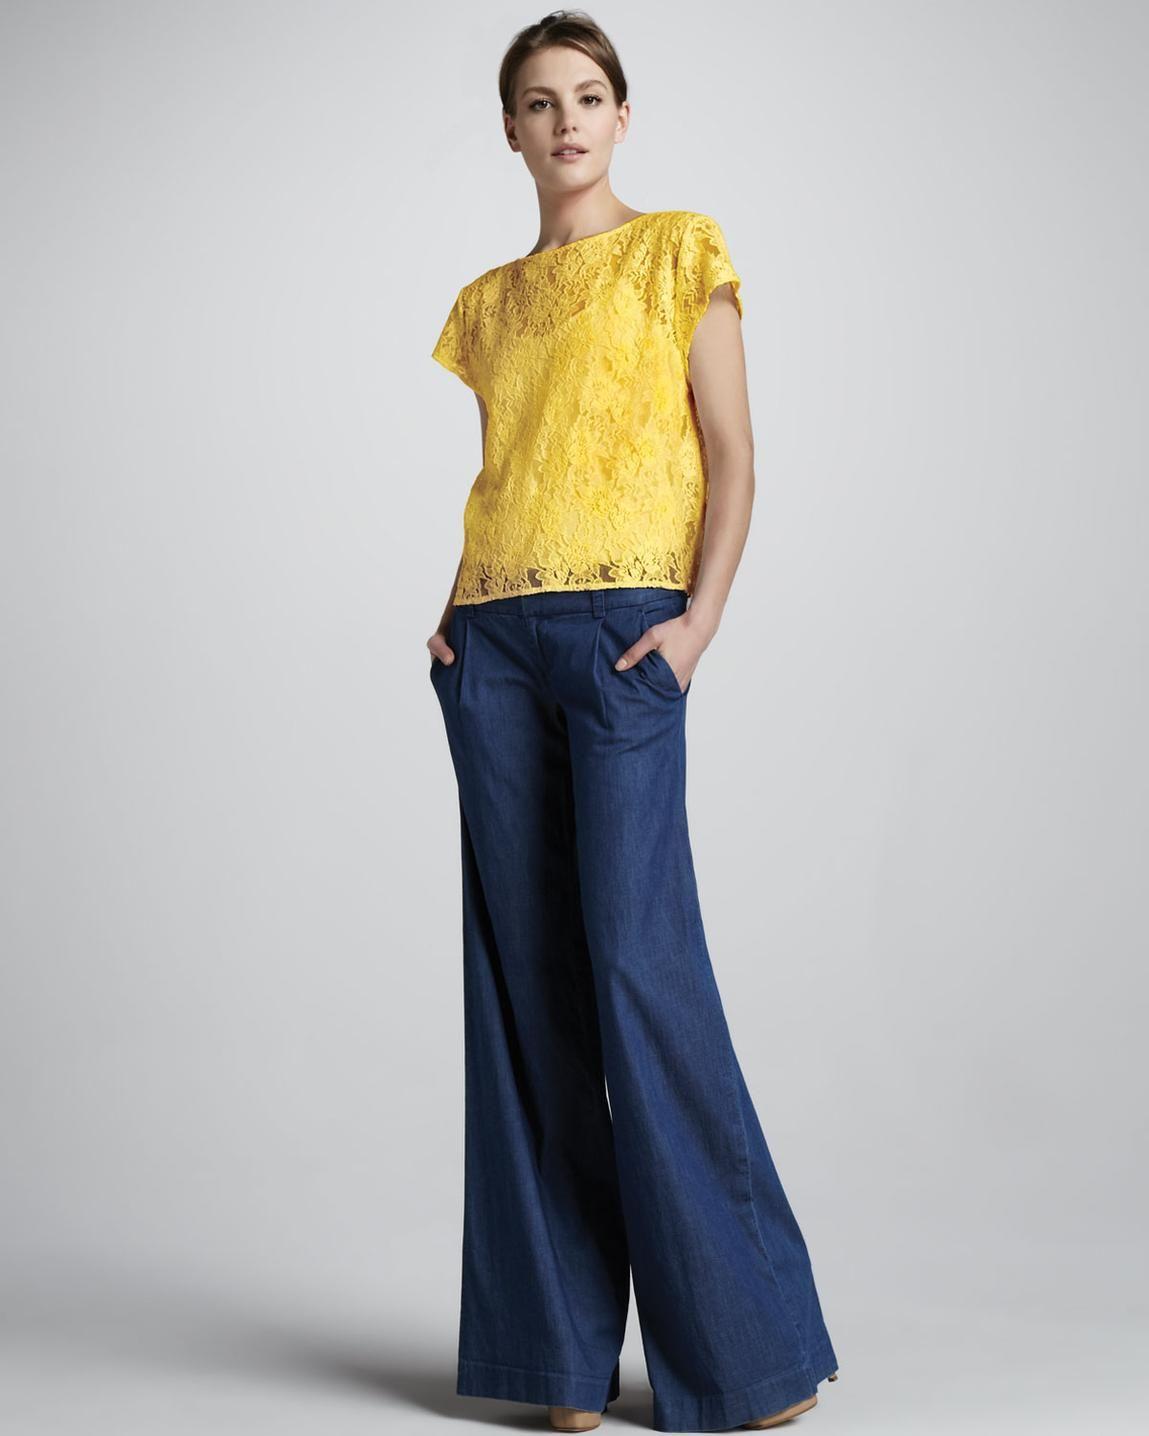 pantalon palazzo fiesta - Buscar con Google | gloria lula ...